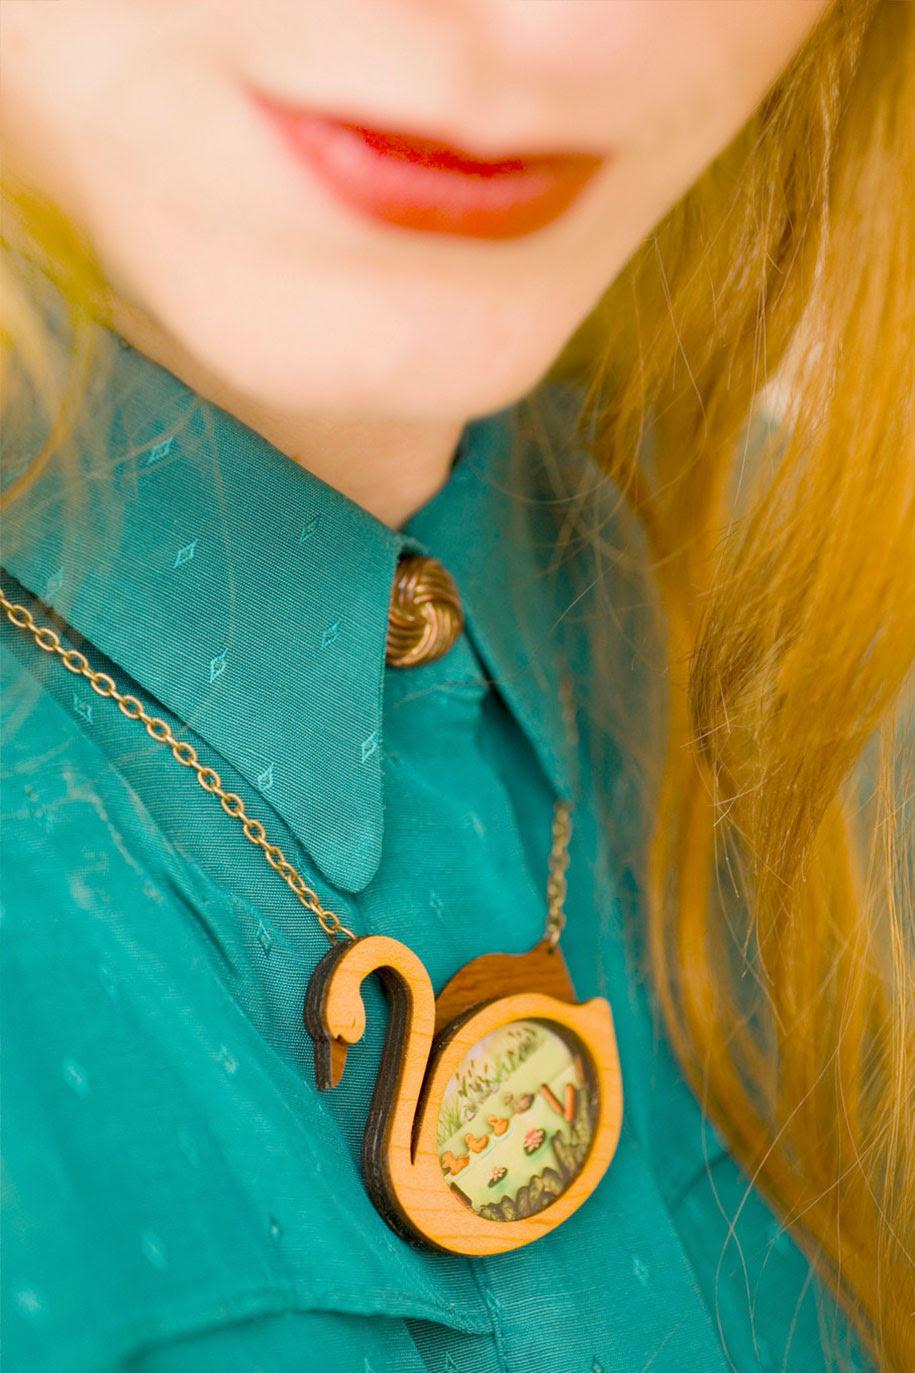 fairytale-necklaces-scenes-inside-laliblue-gemma-arnal-jerico-8